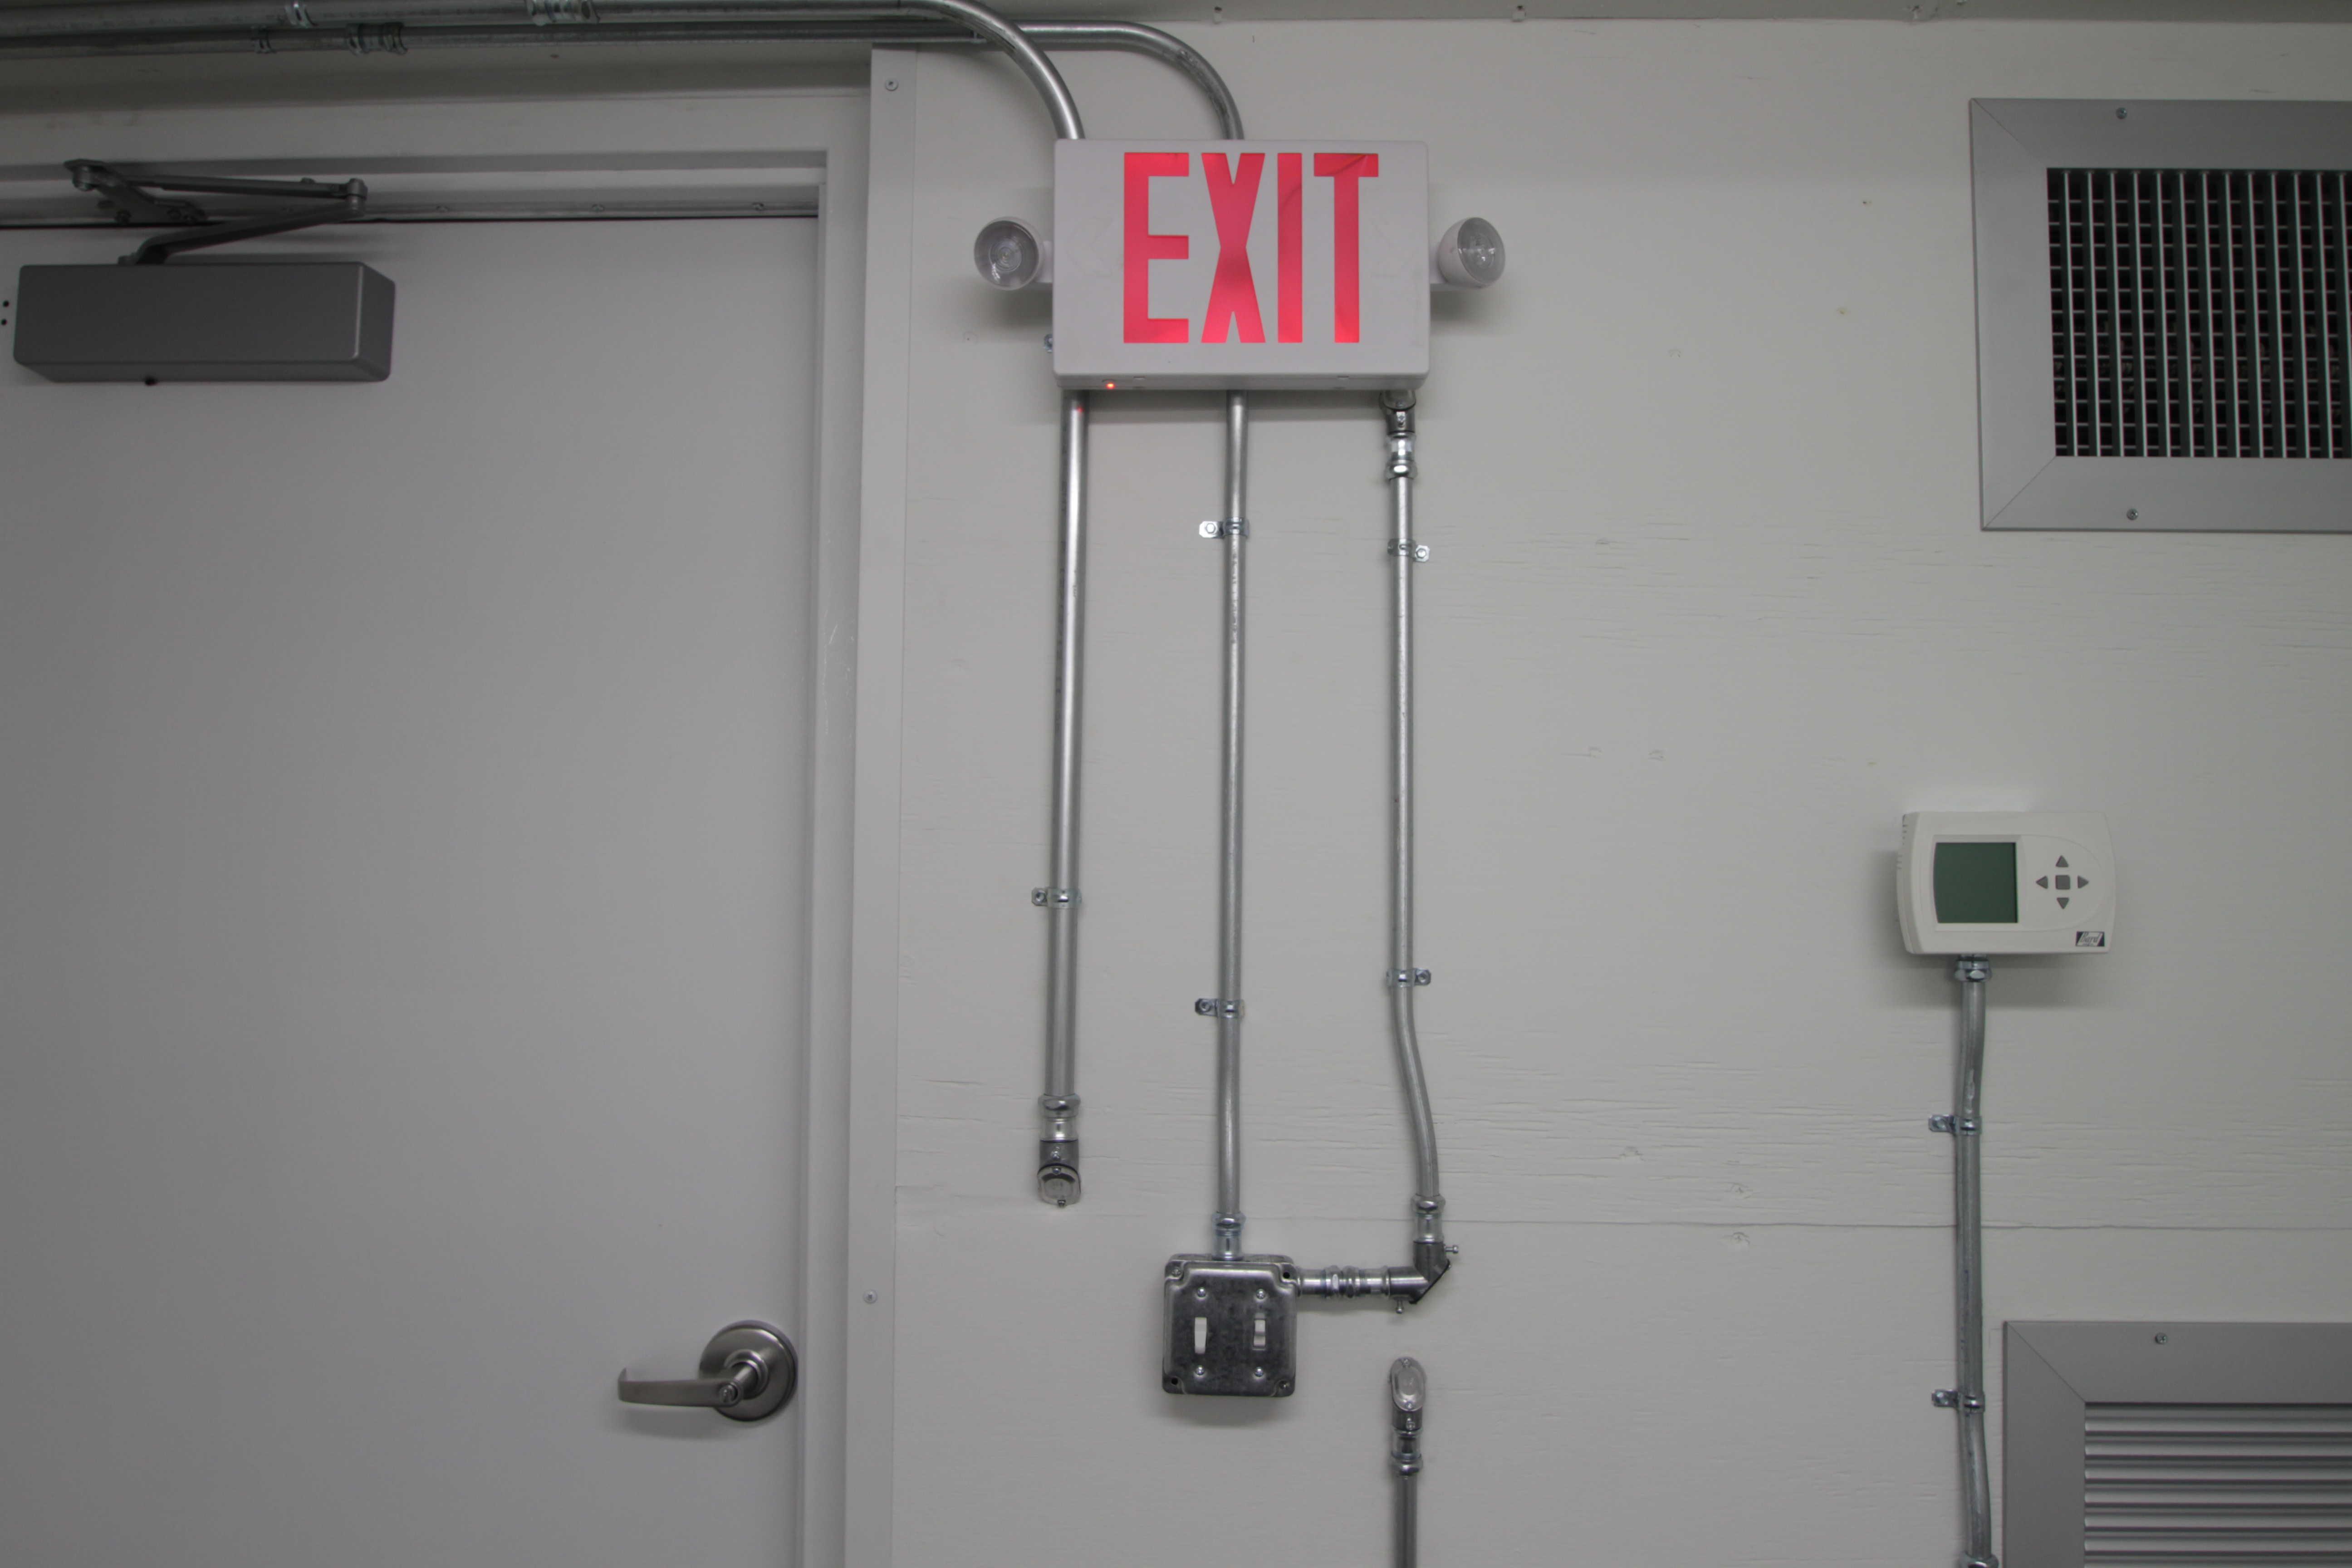 Blast resistant module exit sign